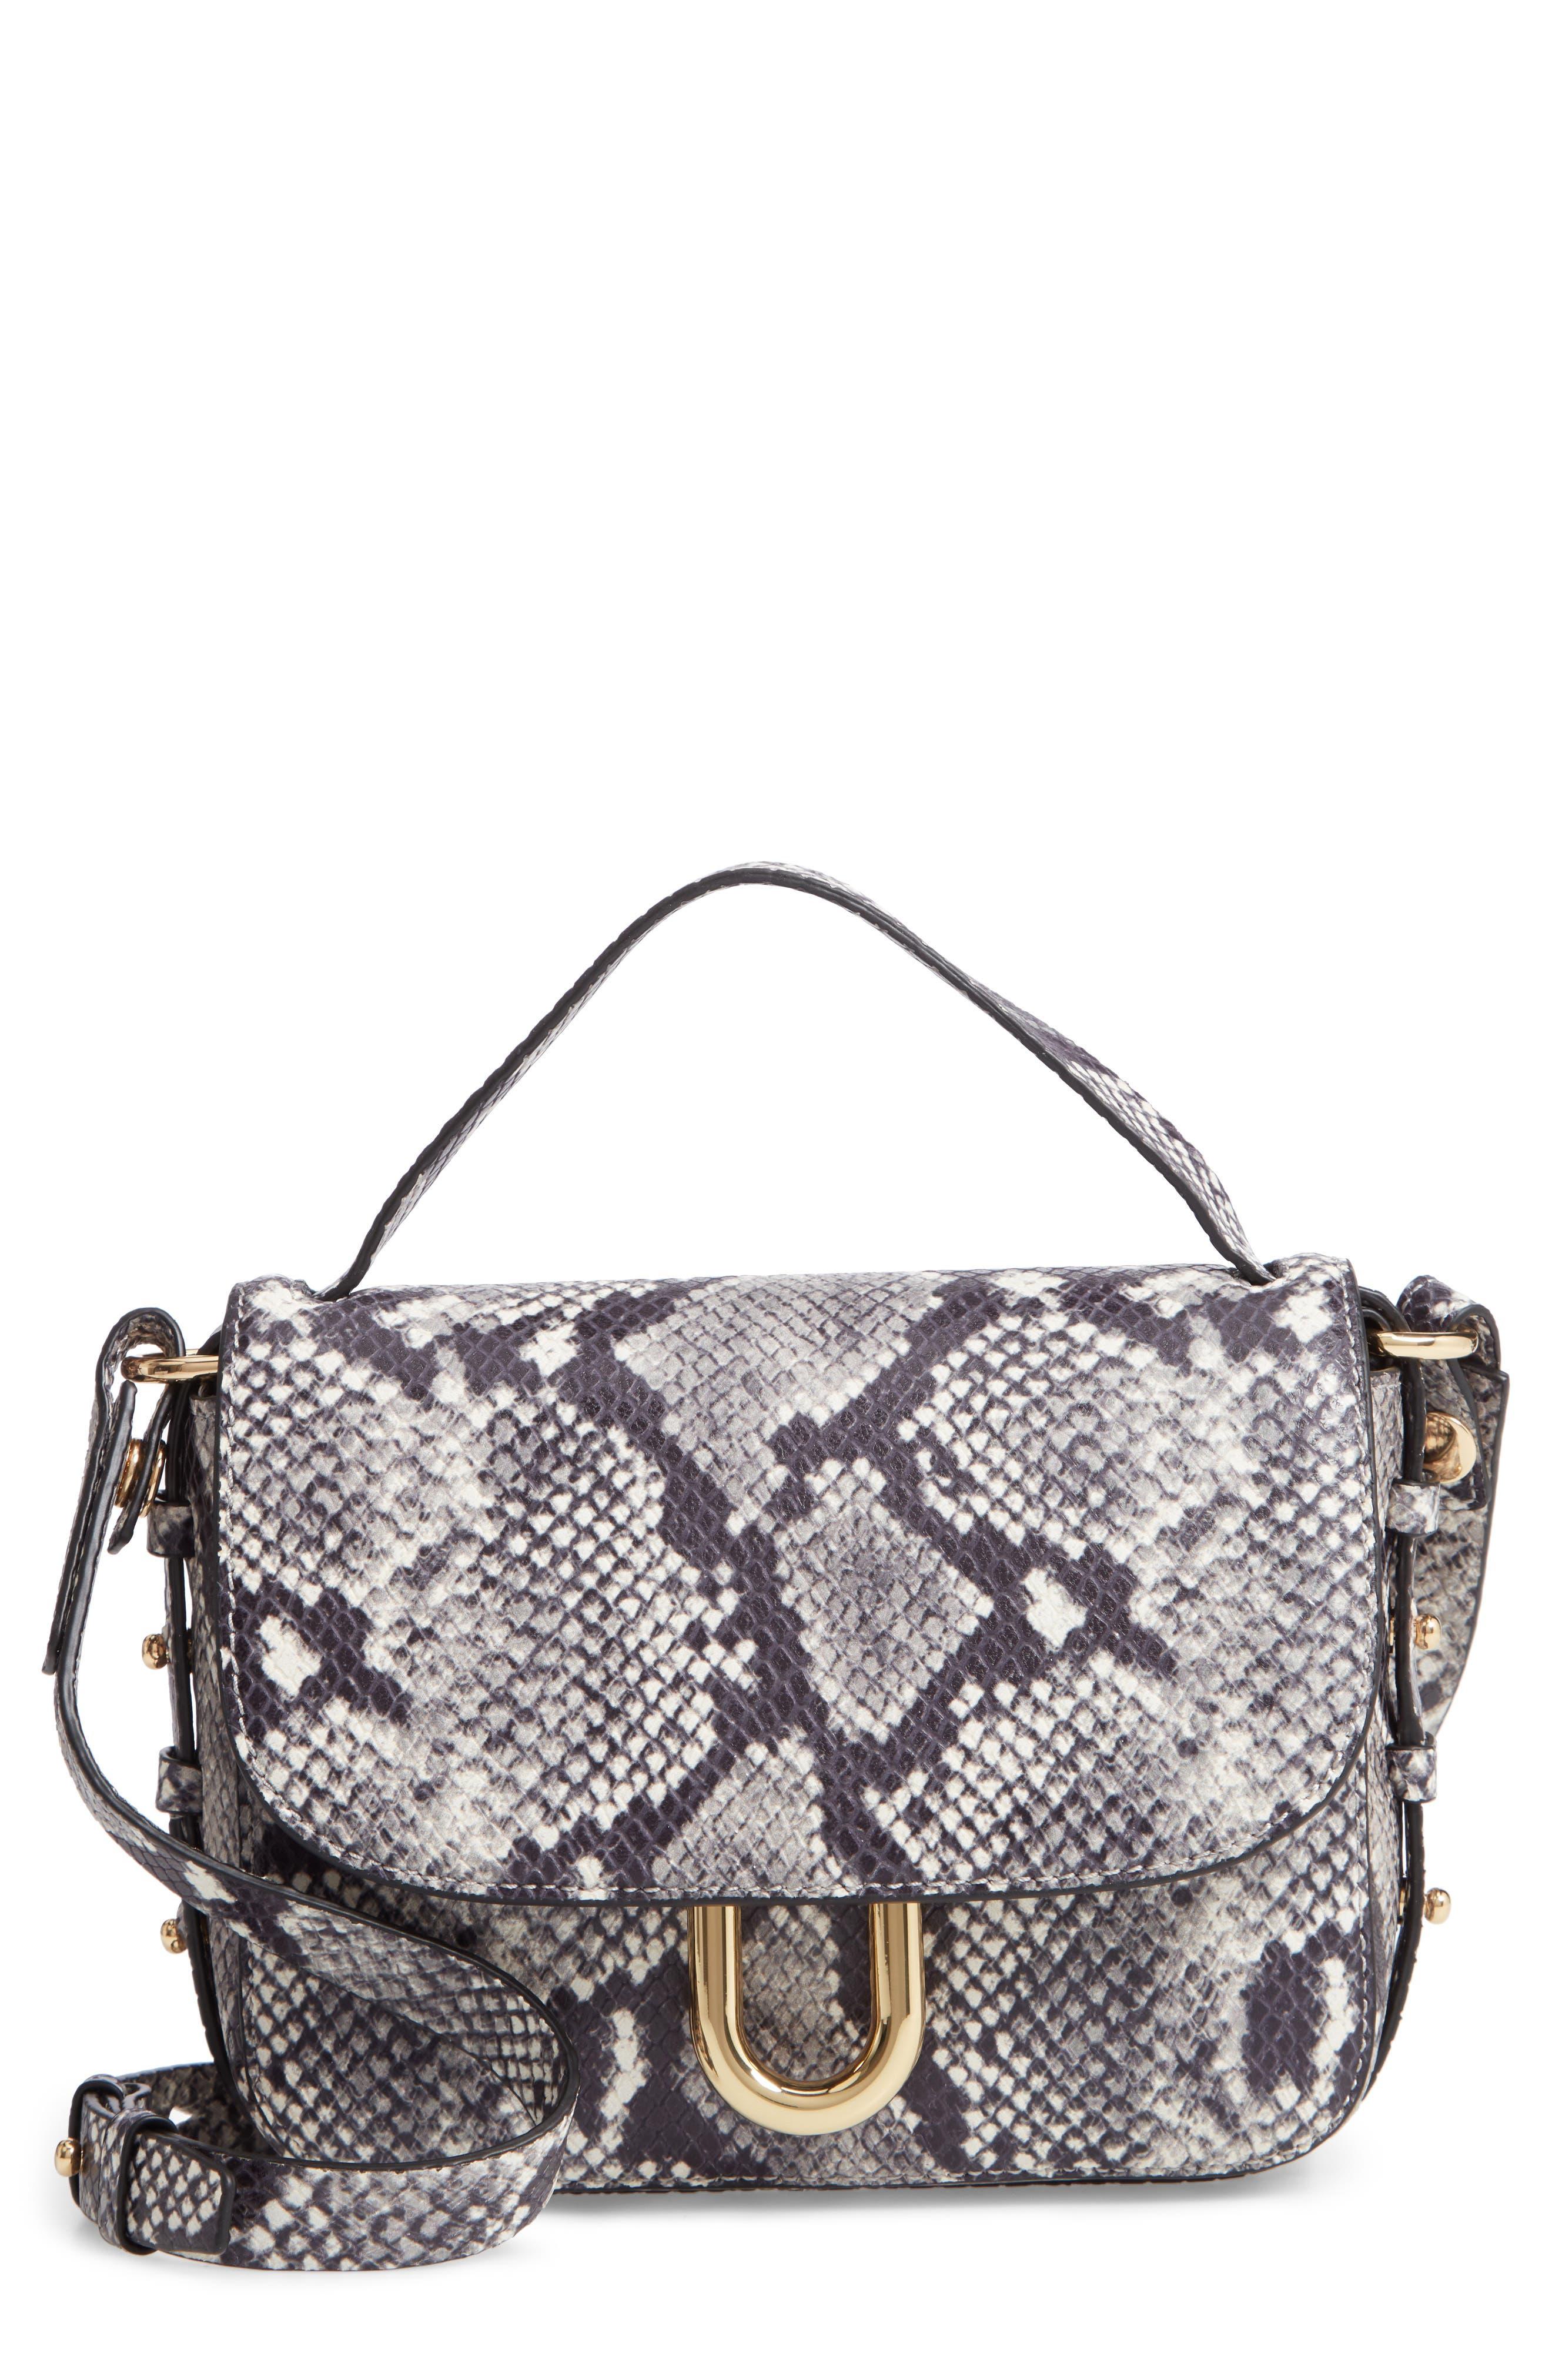 Harper Snake Embossed Leather Crossbody Bag, Main, color, 020